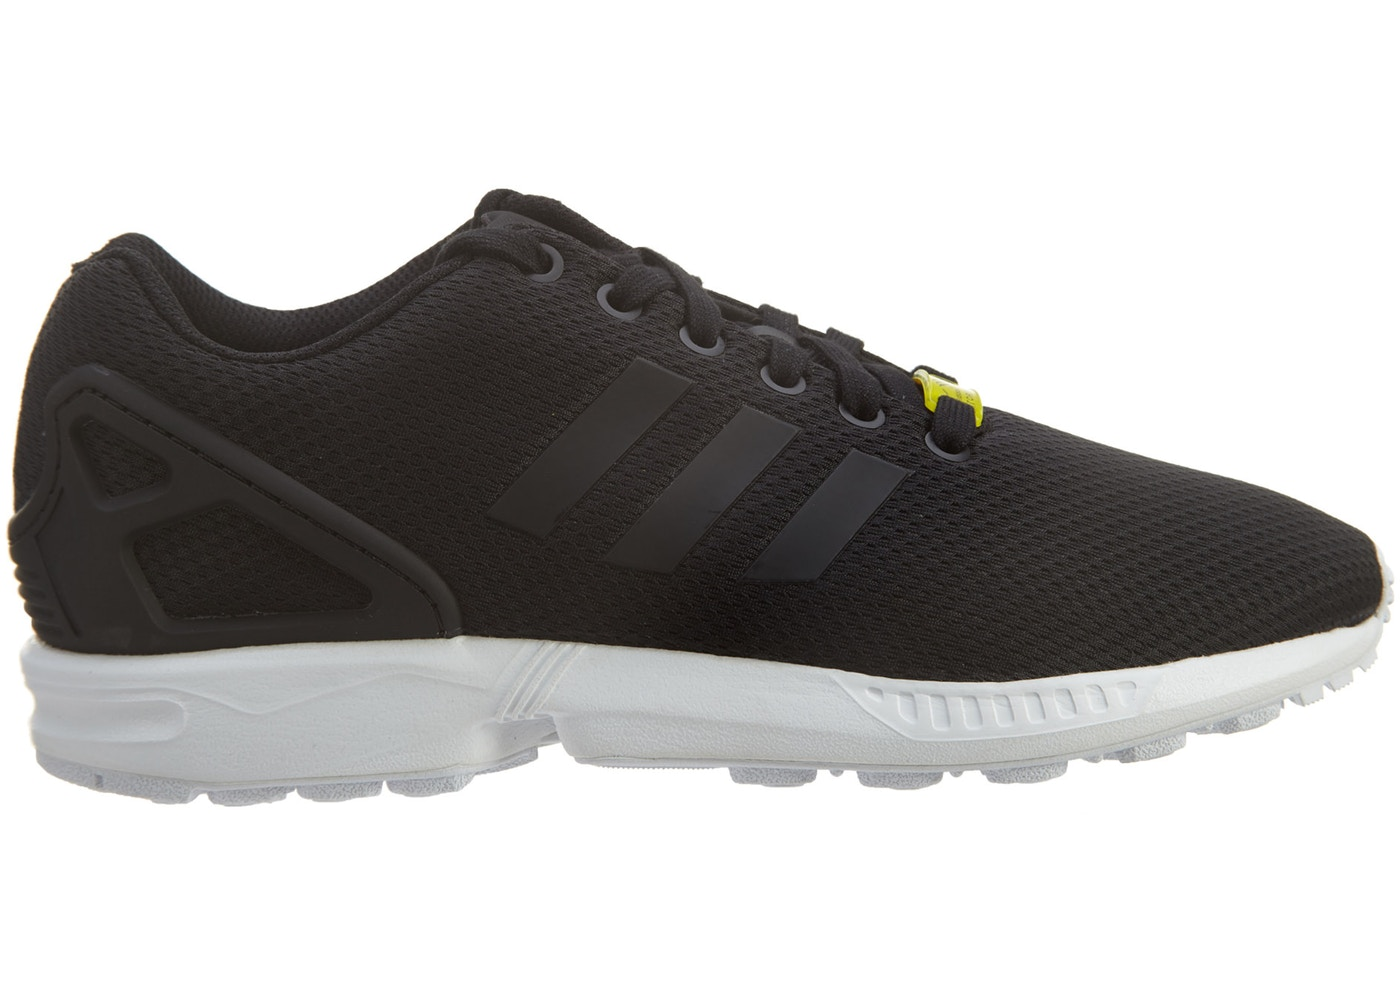 super popular 59124 3dc0d adidas Zx Flux Black/White